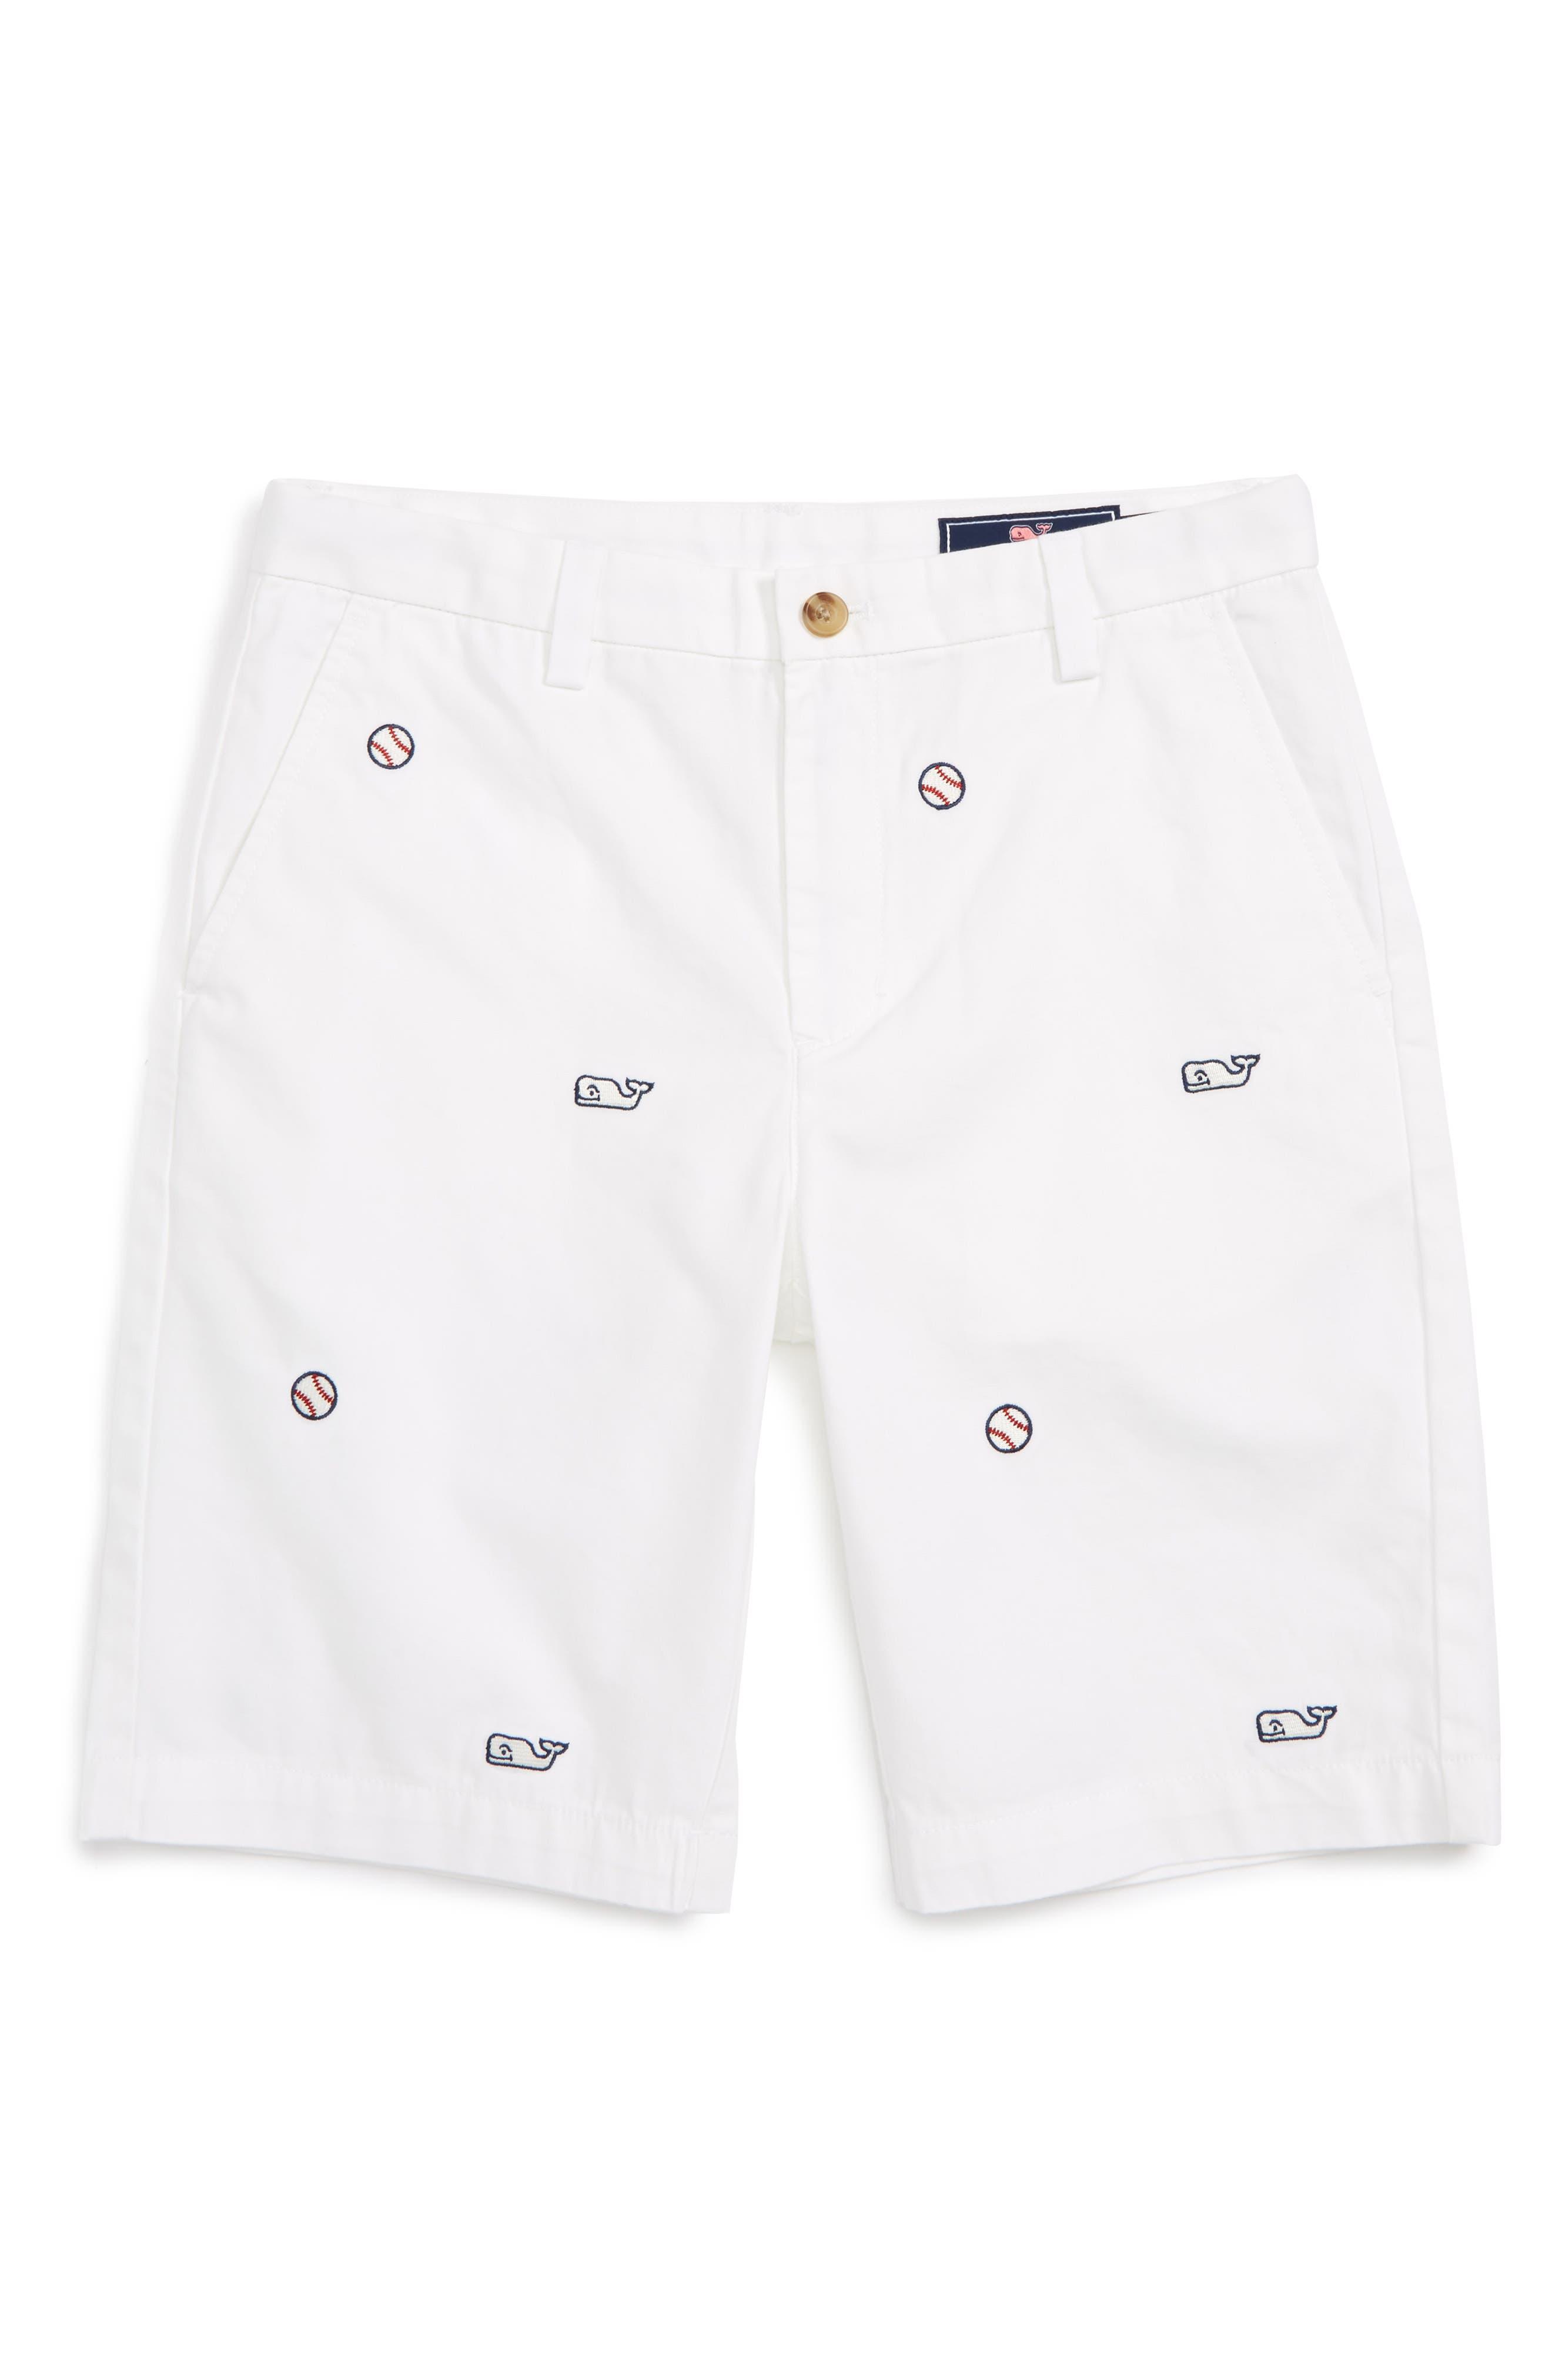 Vineyard Vines Sports Embroidered Breaker Shorts (Toddler Boys, Little Boys & Big Boys)